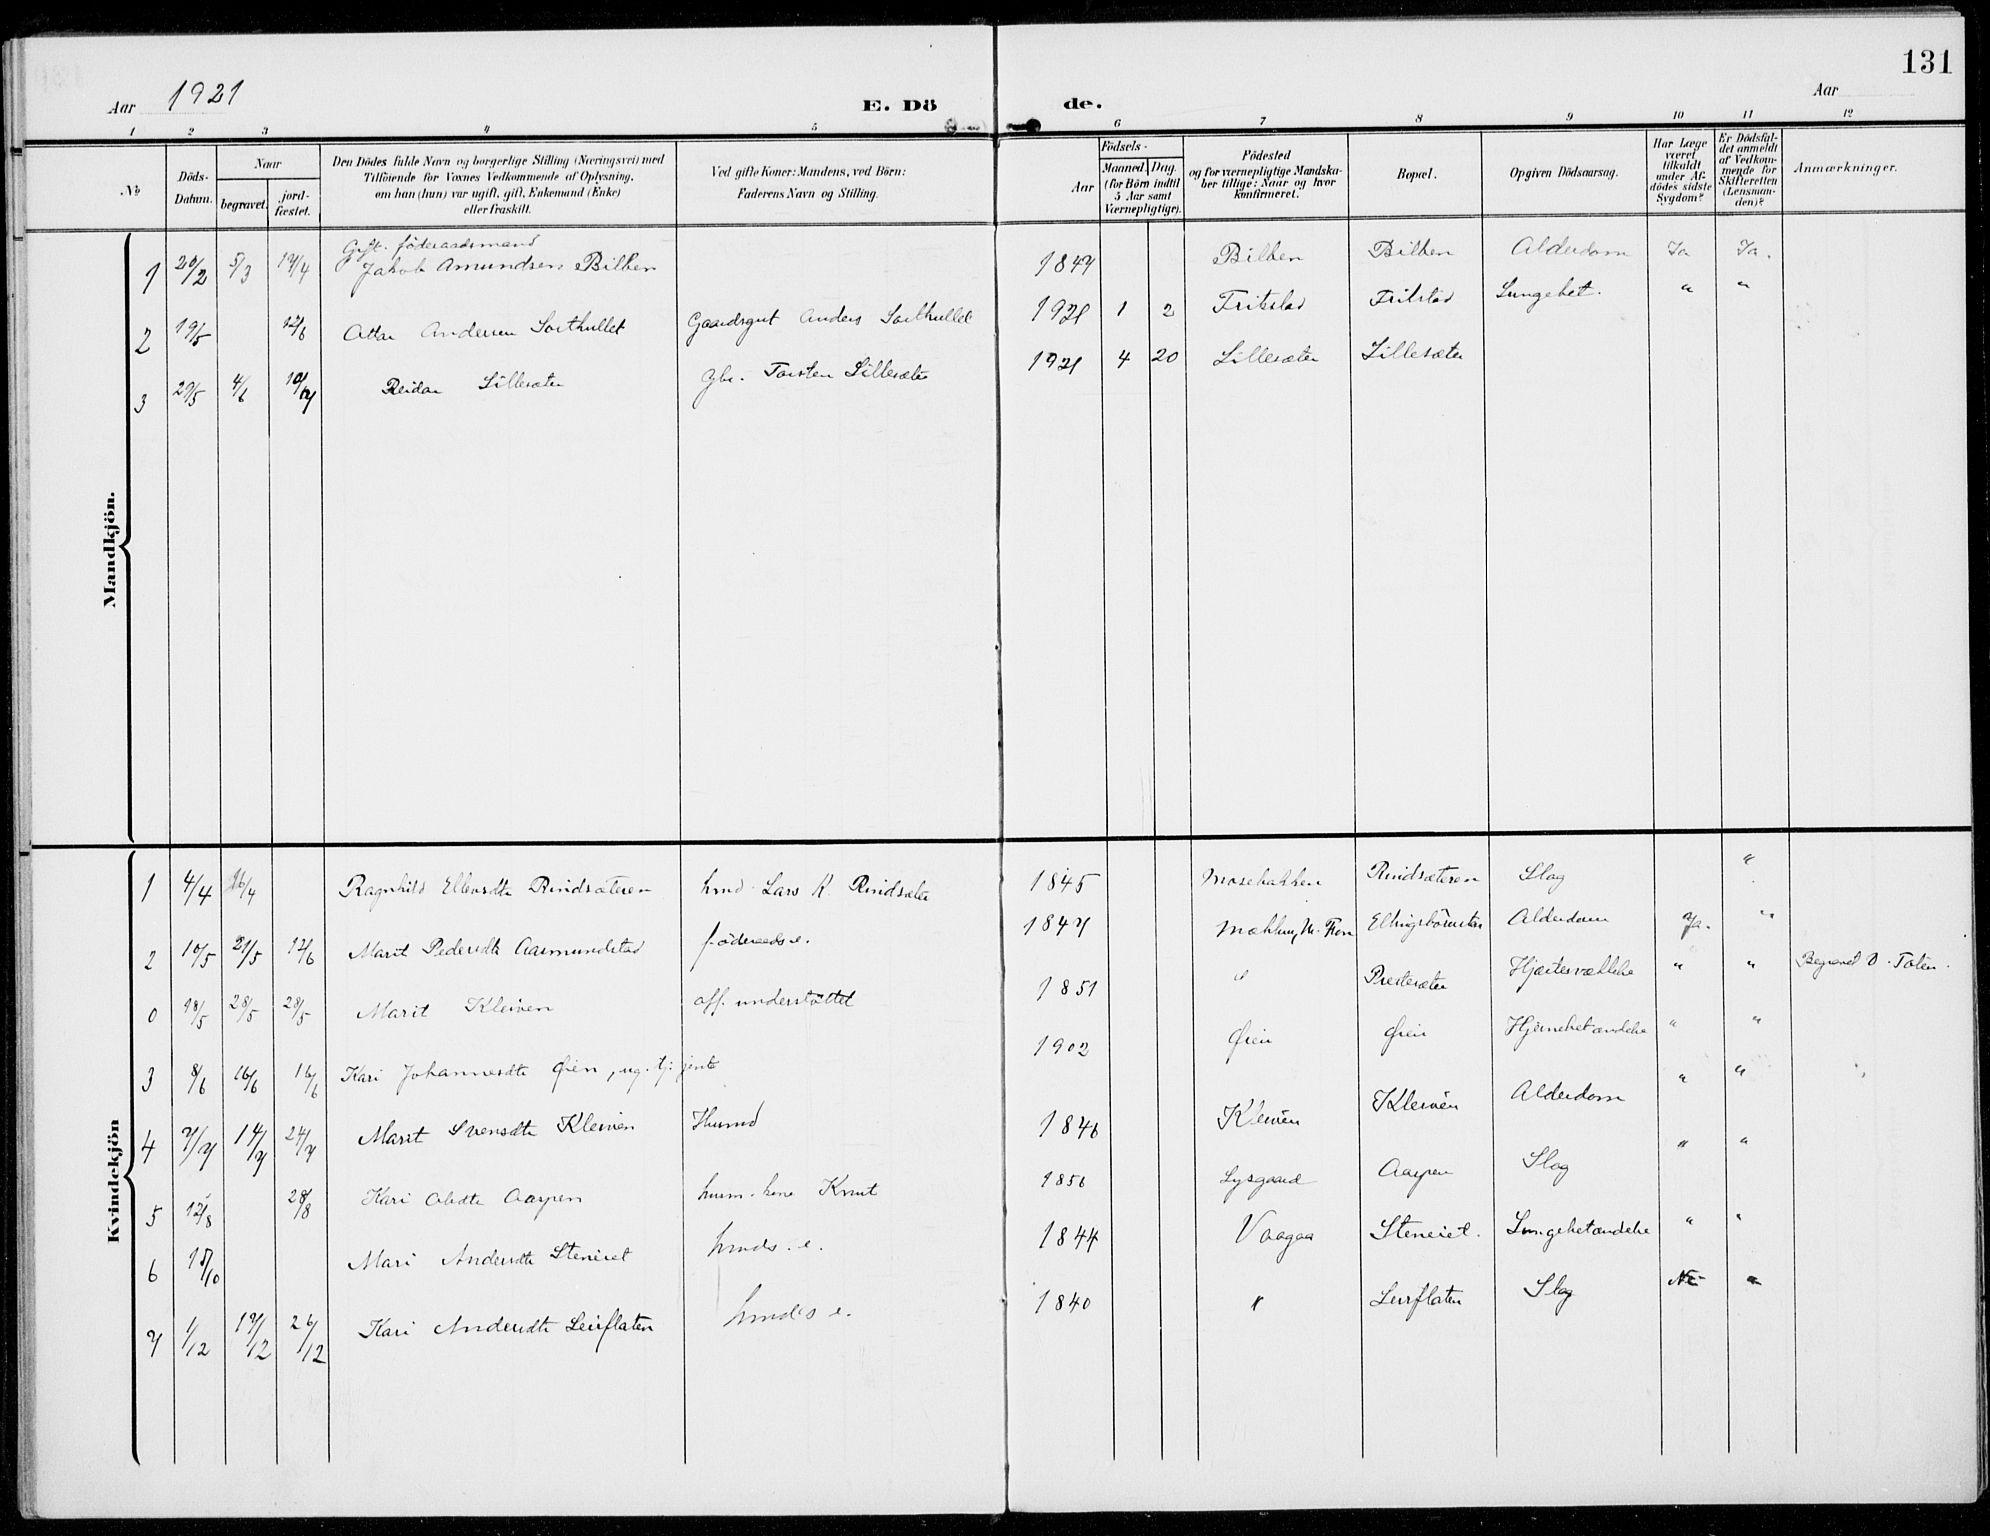 SAH, Sel prestekontor, Ministerialbok nr. 1, 1905-1922, s. 131